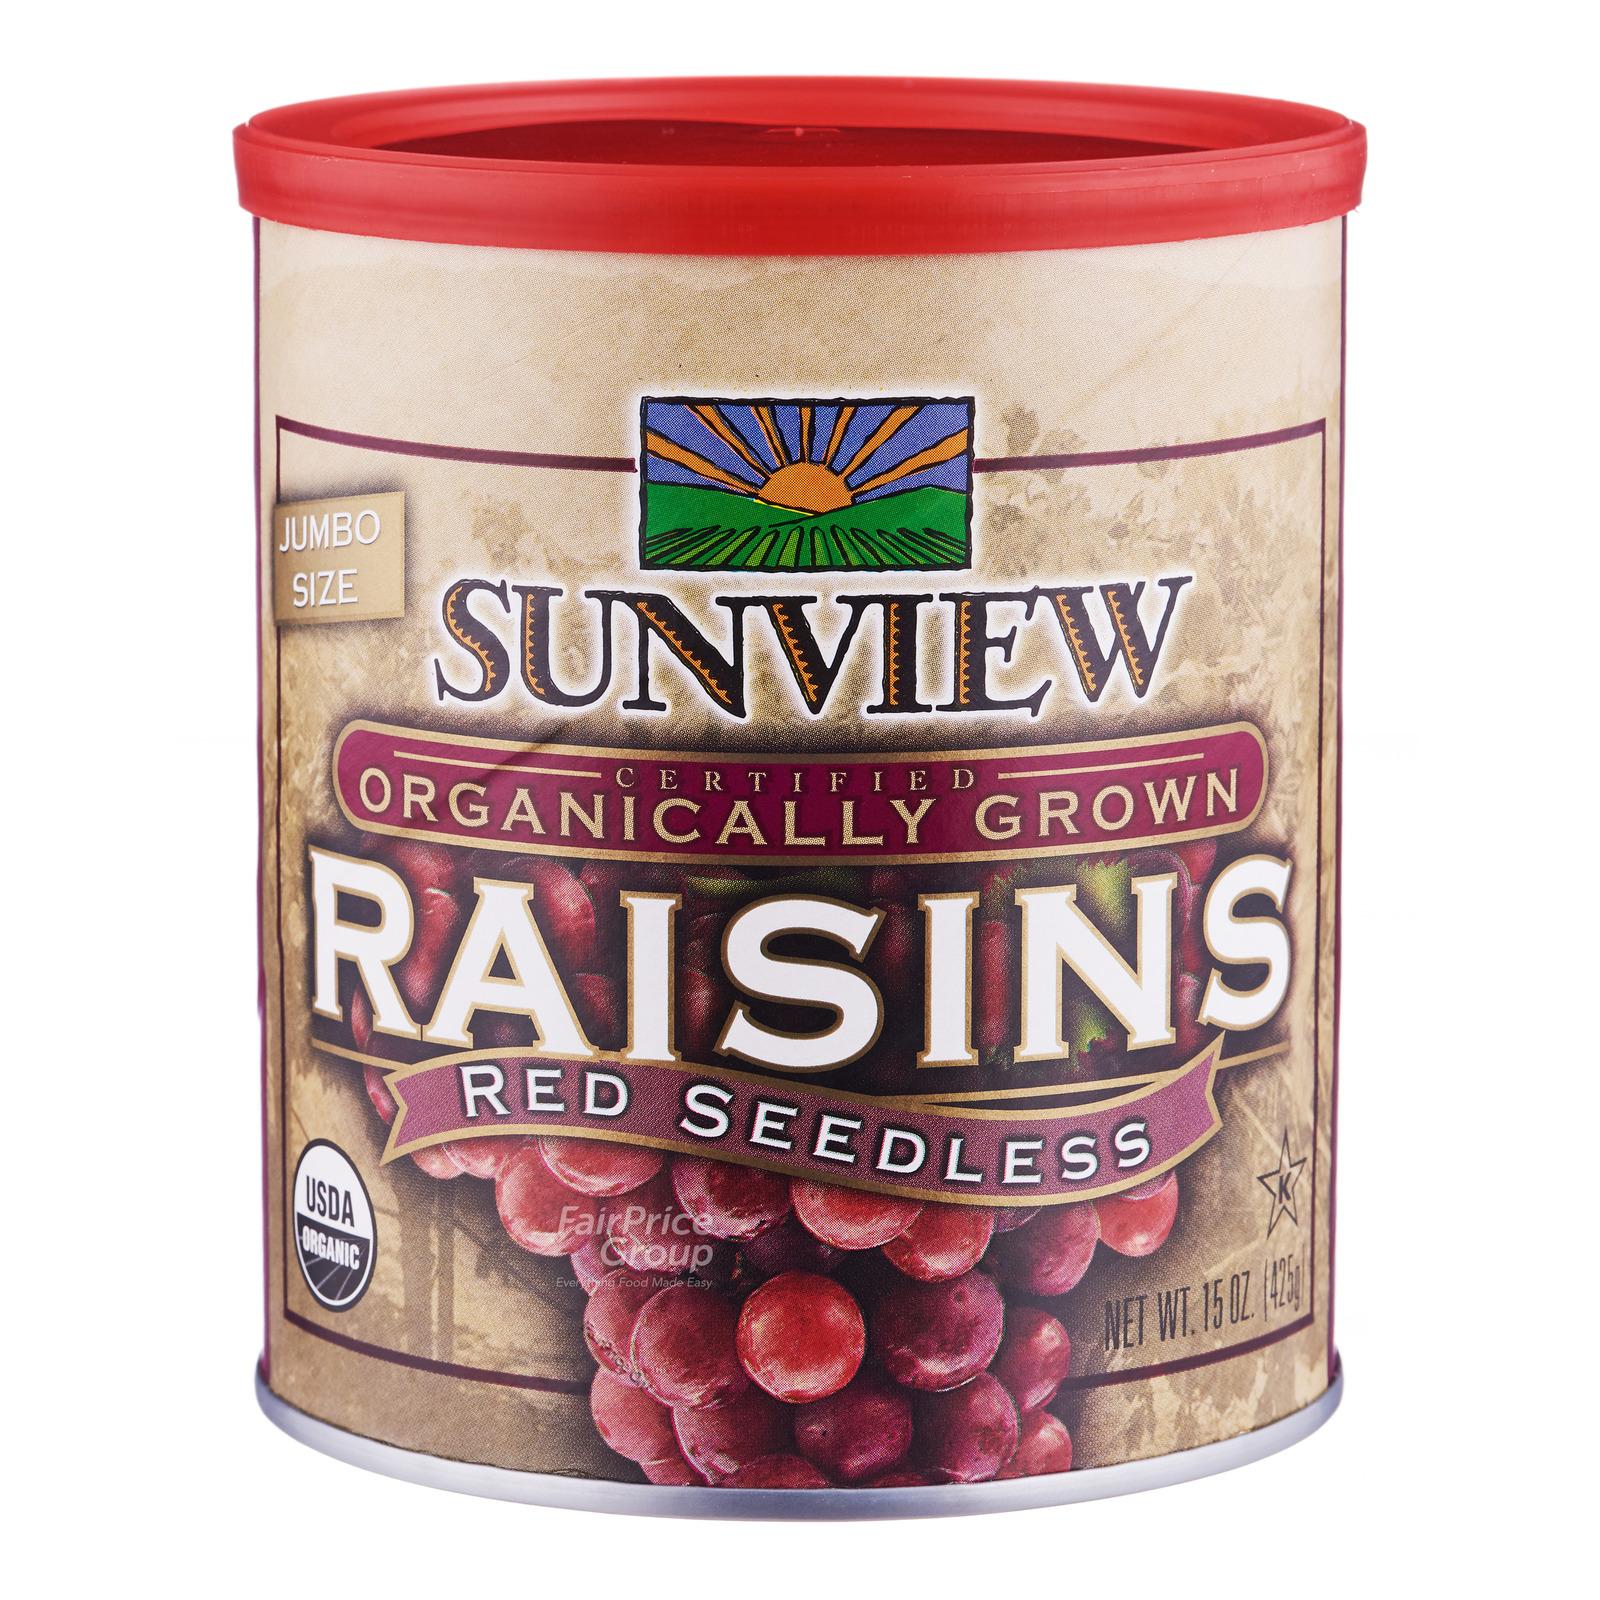 Sunview Organically Grown Raisins - Red Seedless